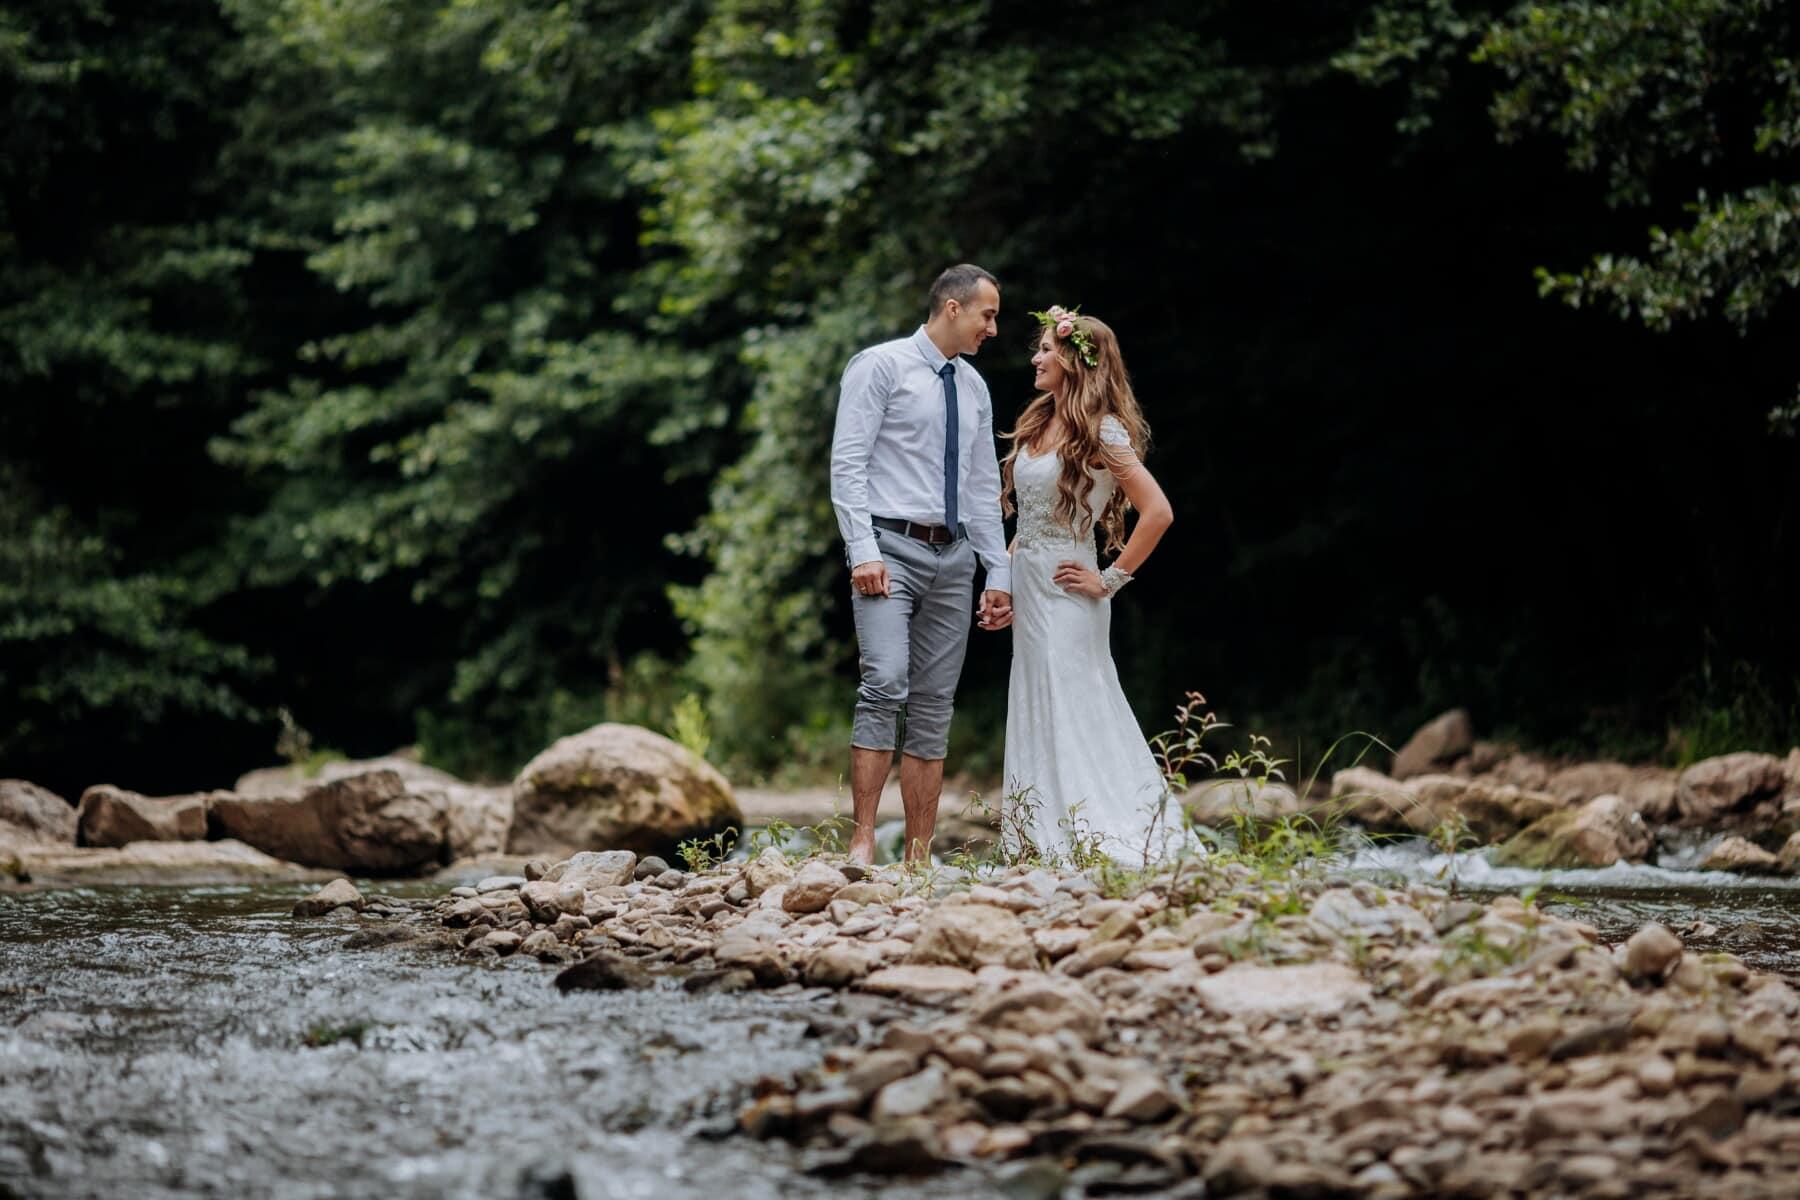 groom, just married, bride, hiking, creek, riverbank, love, person, farmer, woman